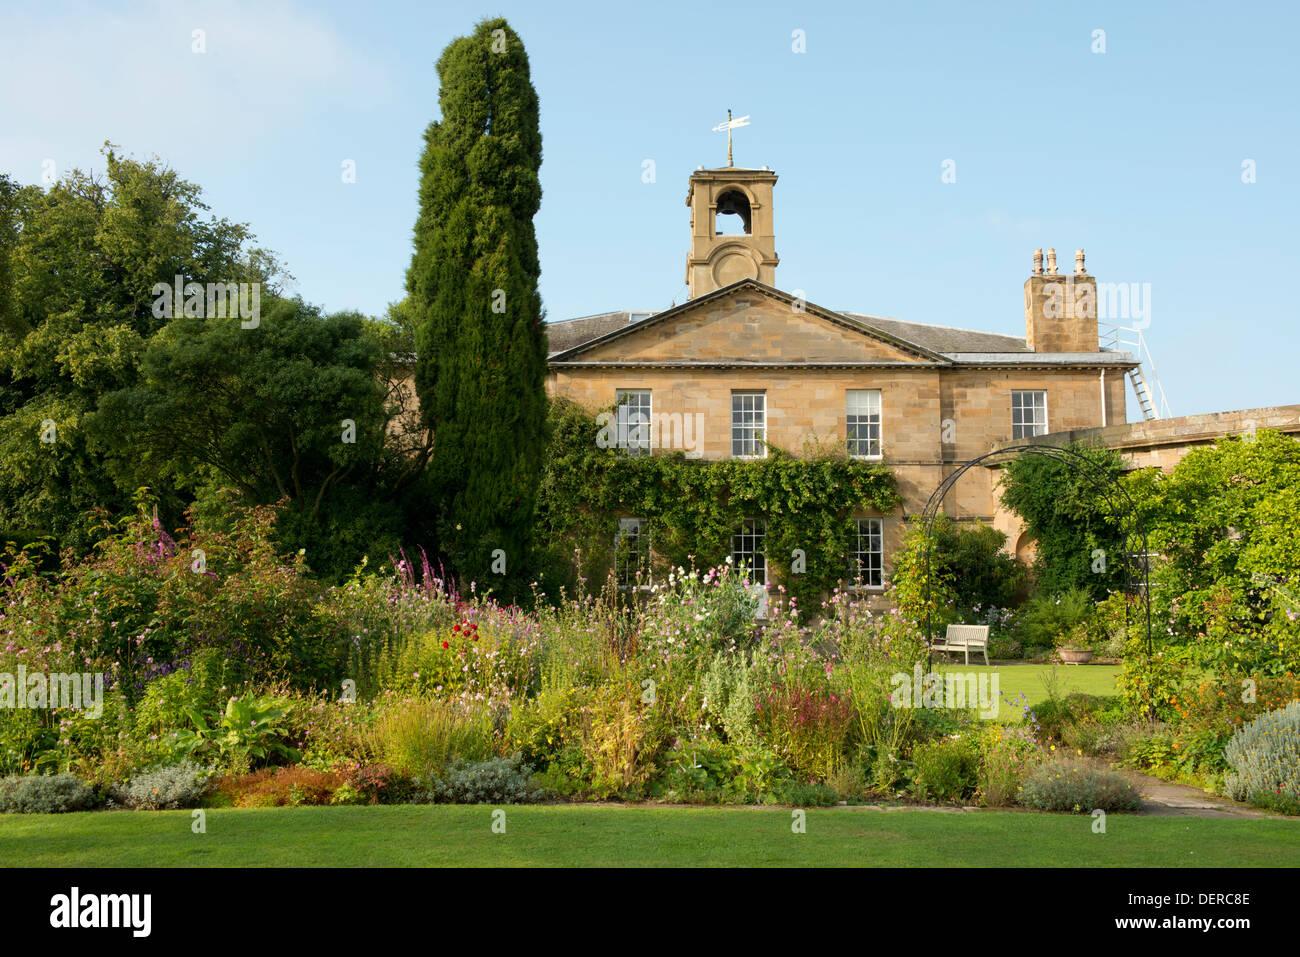 The garden at Howick Hall, Alnwick, Northumberland, UK - Stock Image